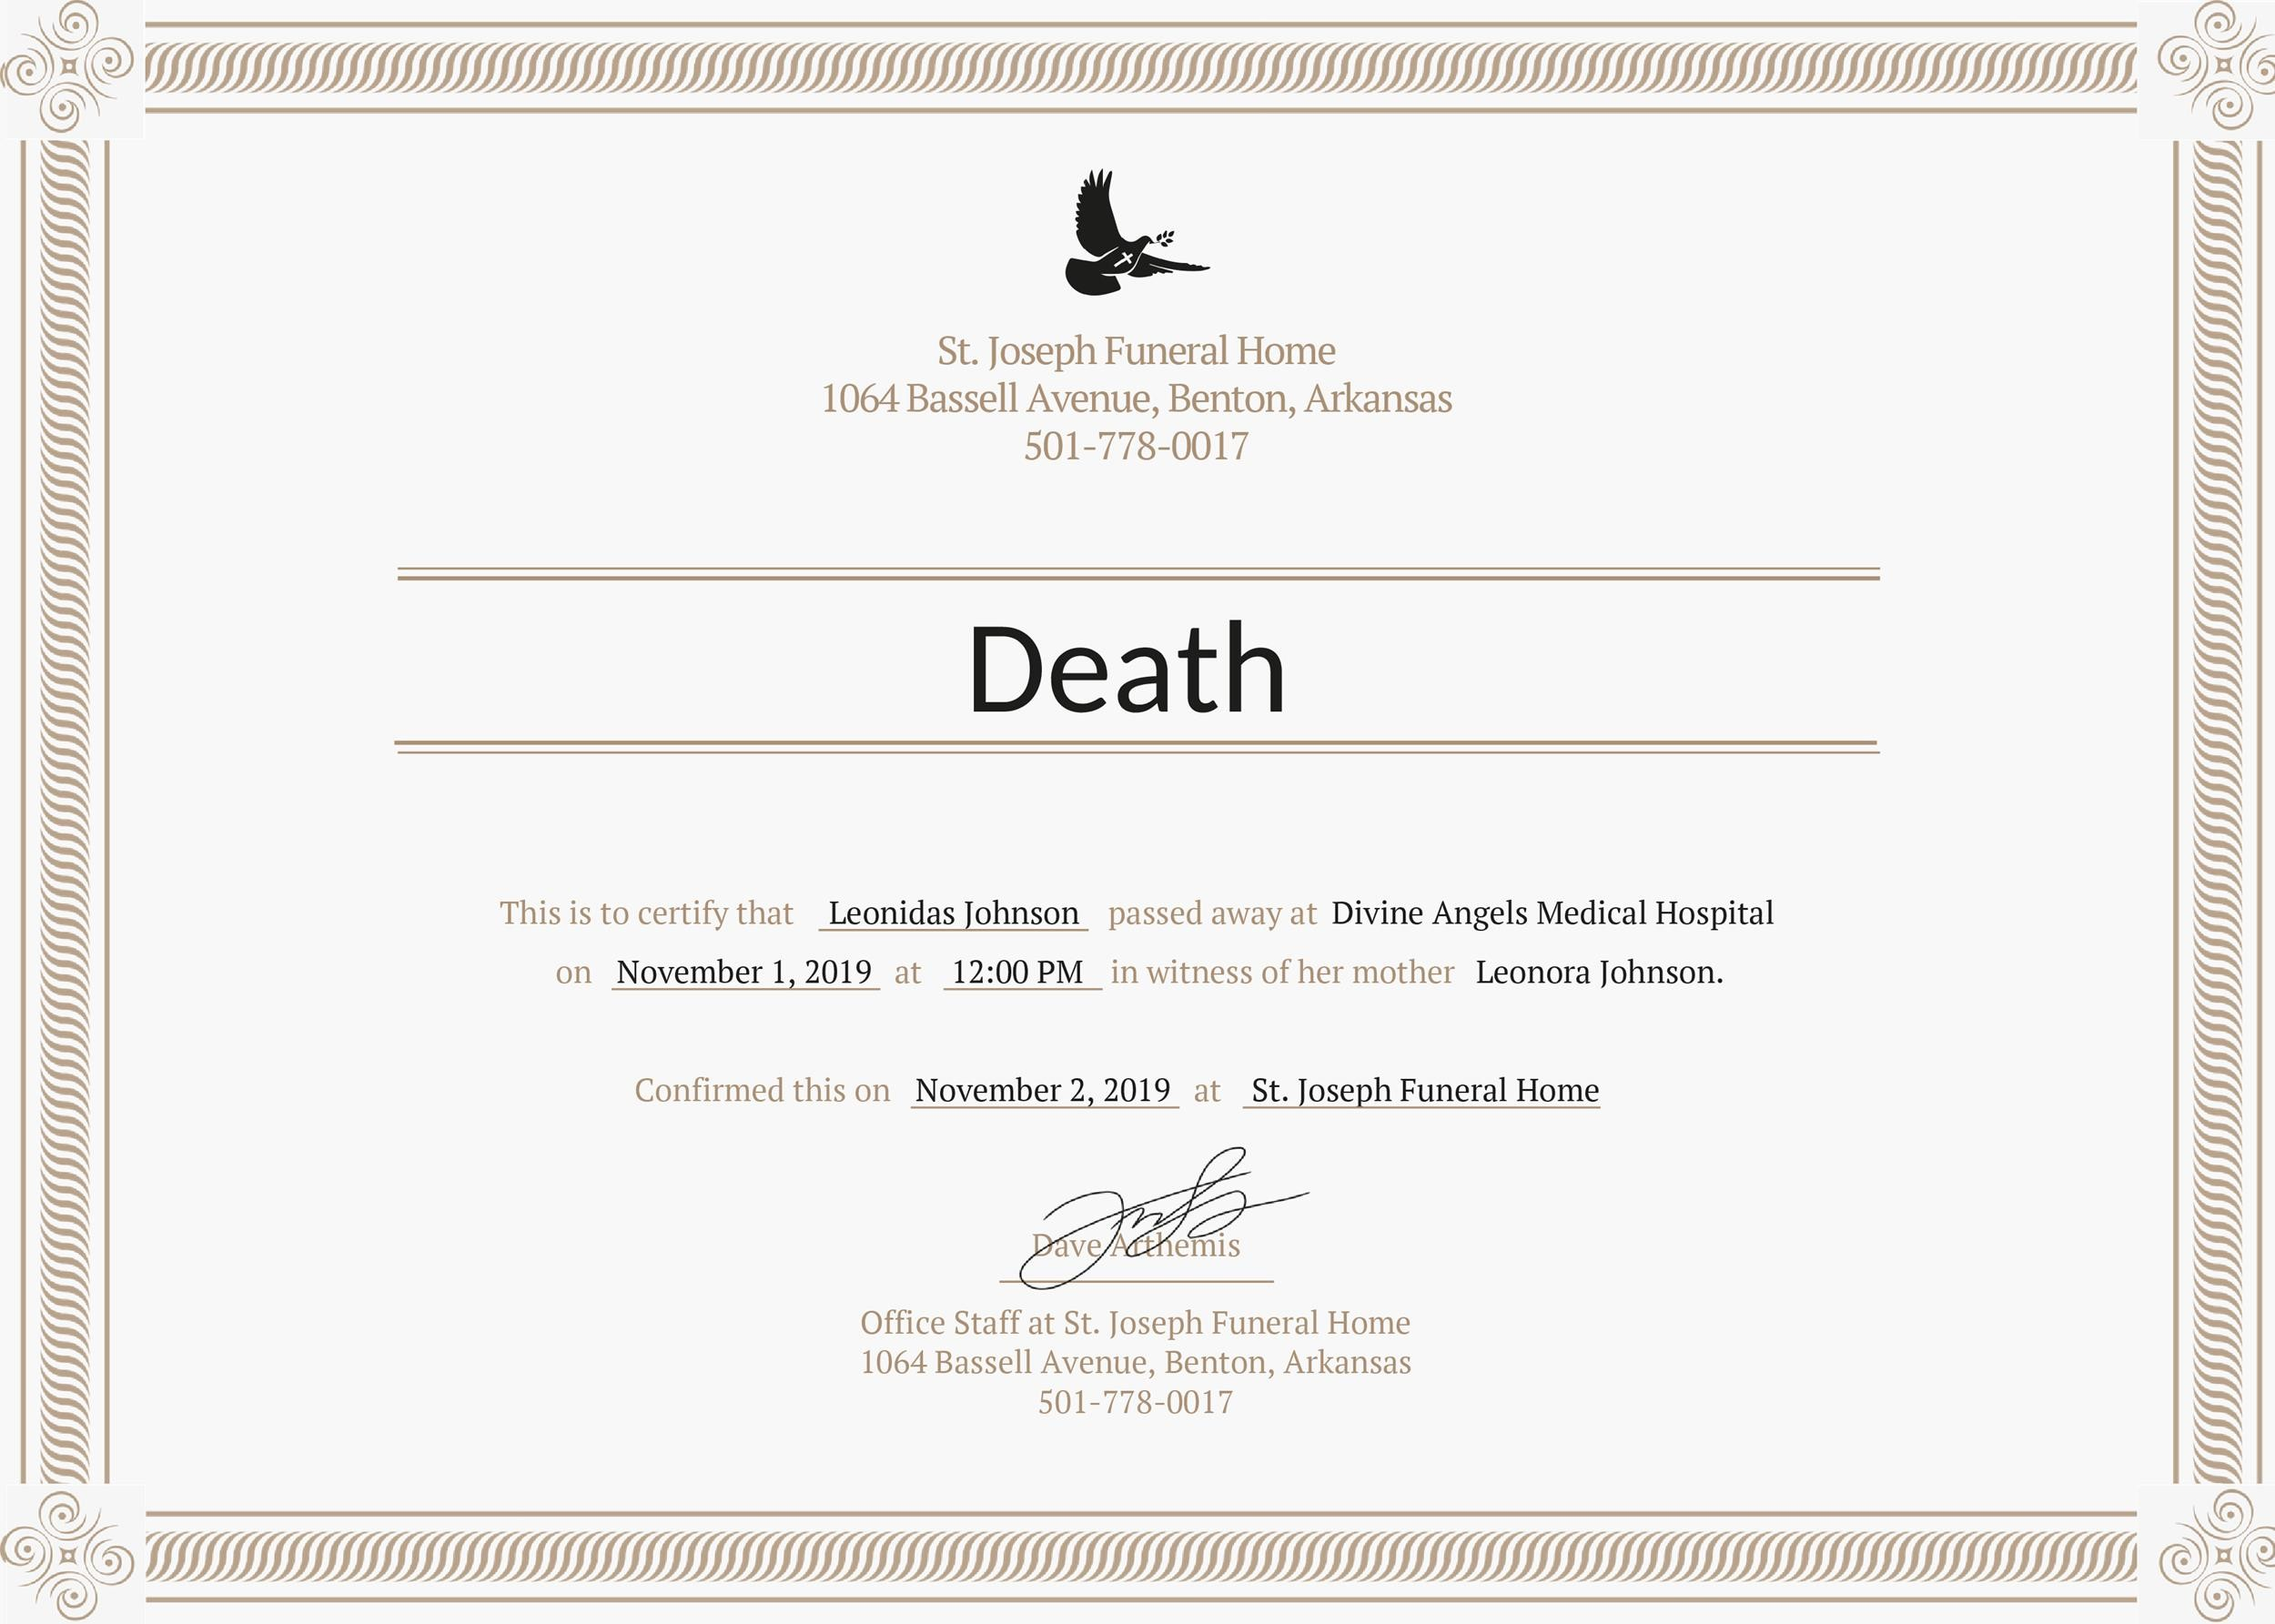 Free death certificate template 01